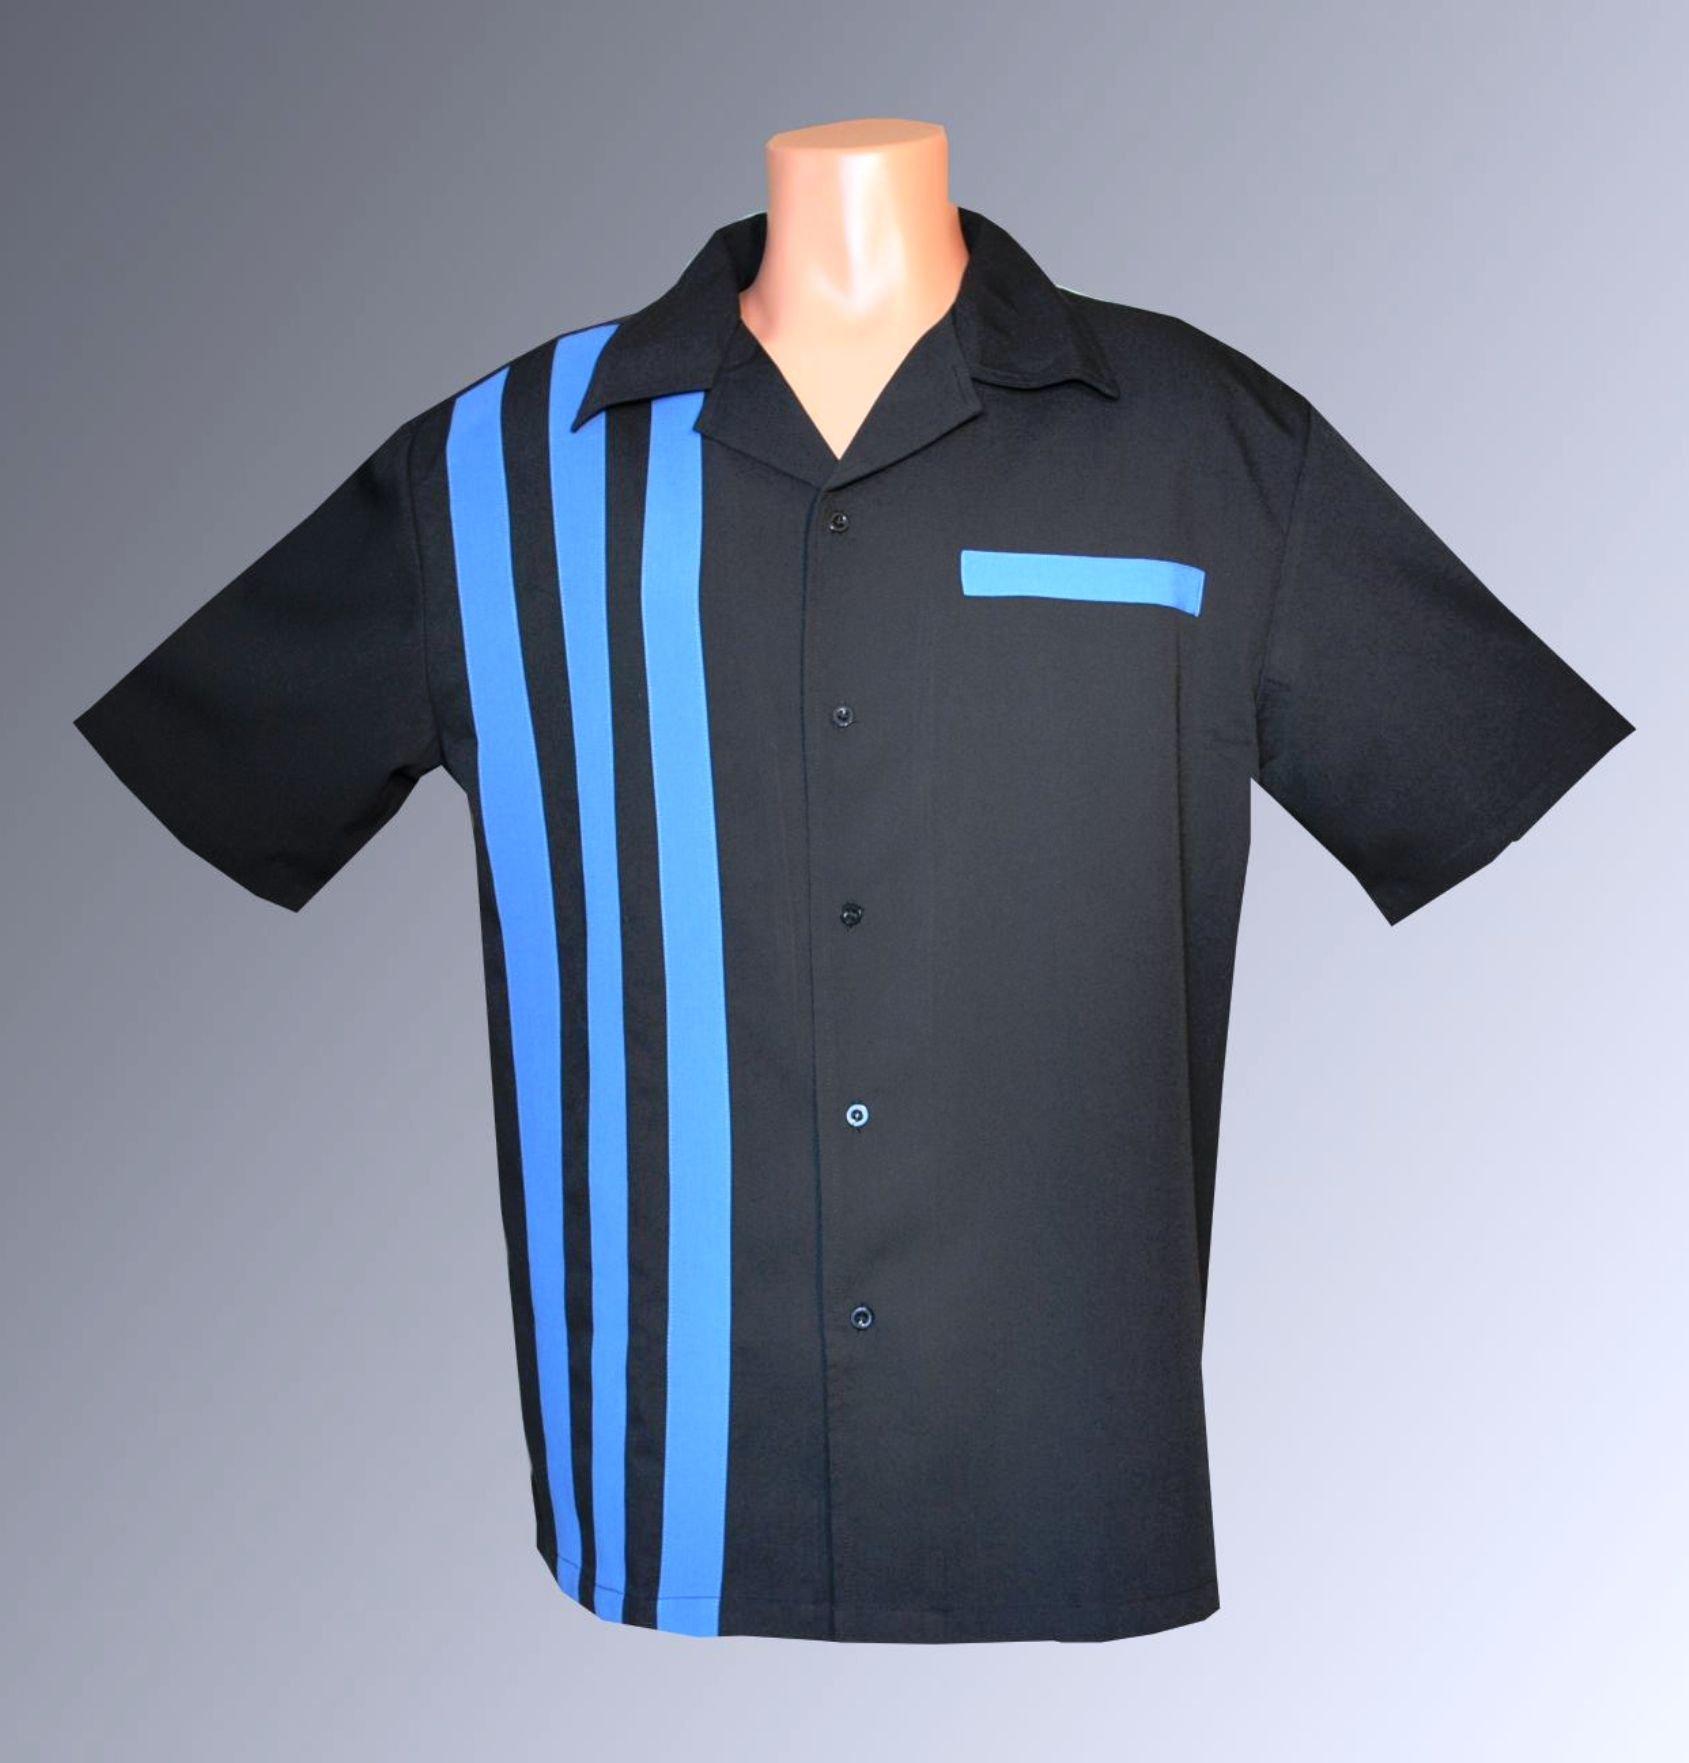 Attila Bowling Shirt Big and Tall Retro 50s Charlie Sheen BluRef Pocket (Medium) by Designs by Attila